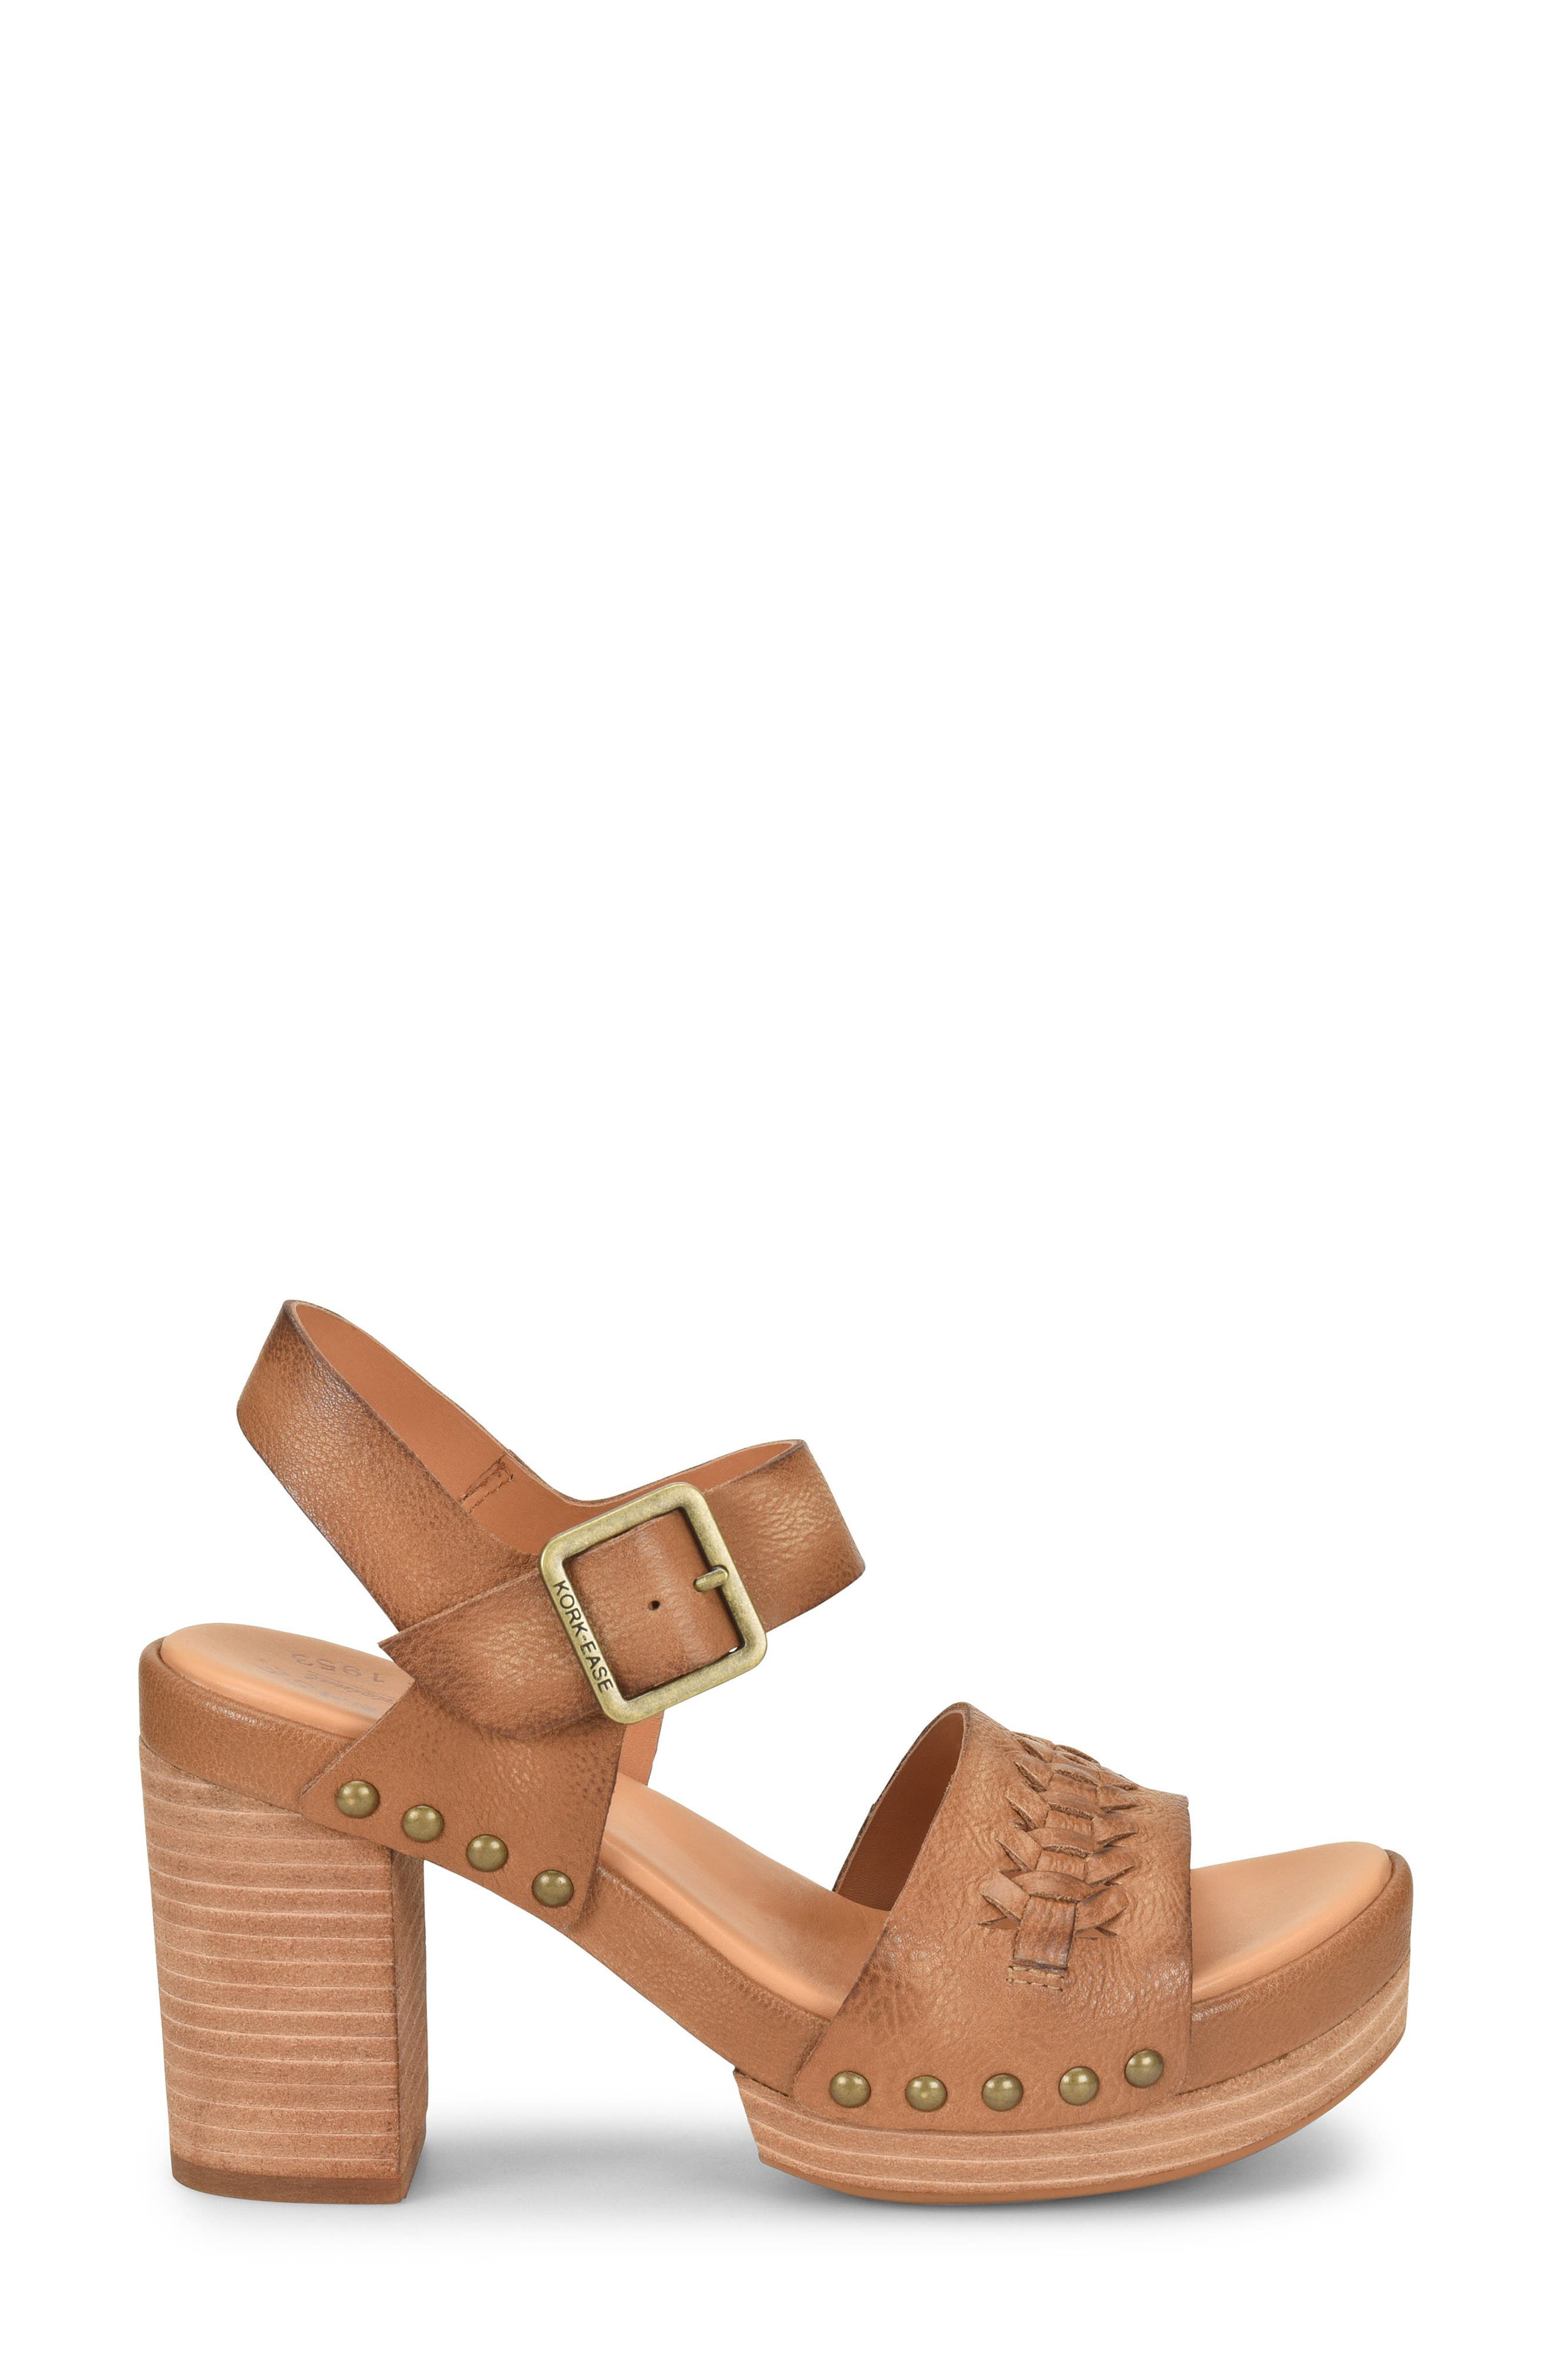 Pasilla Platform Sandal,                             Alternate thumbnail 3, color,                             Light Brown Leather